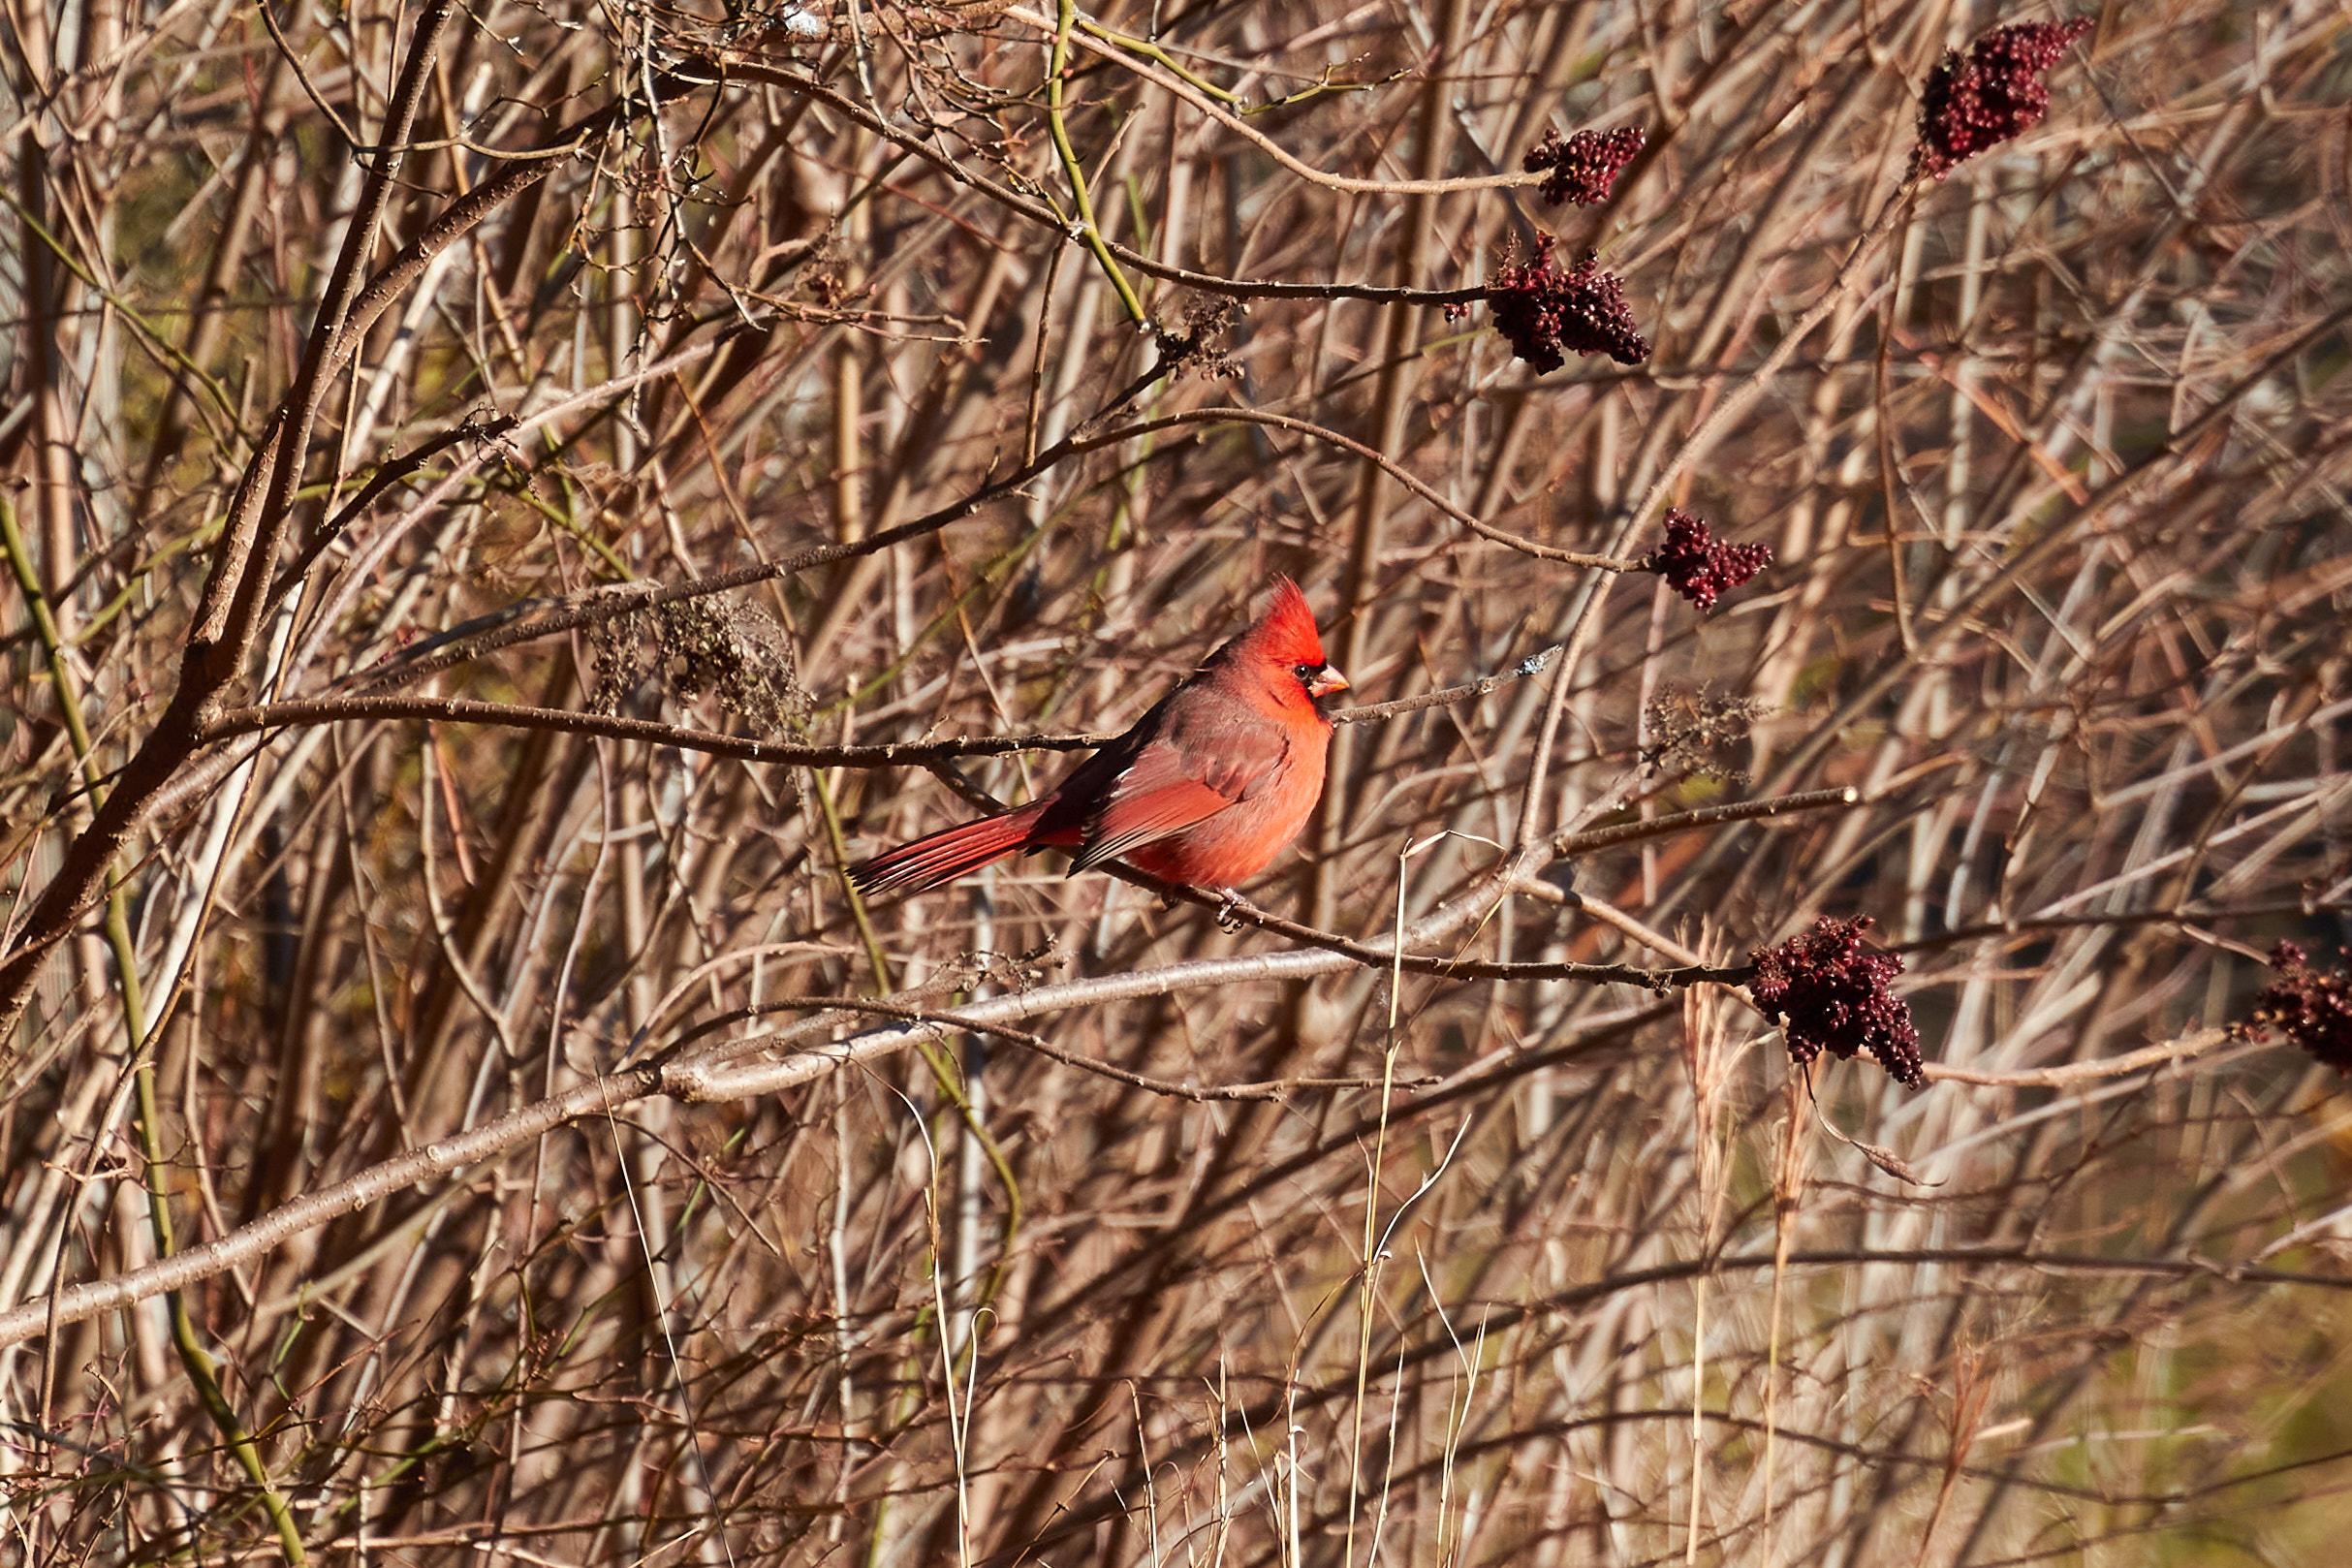 Cardinal on tree branch.